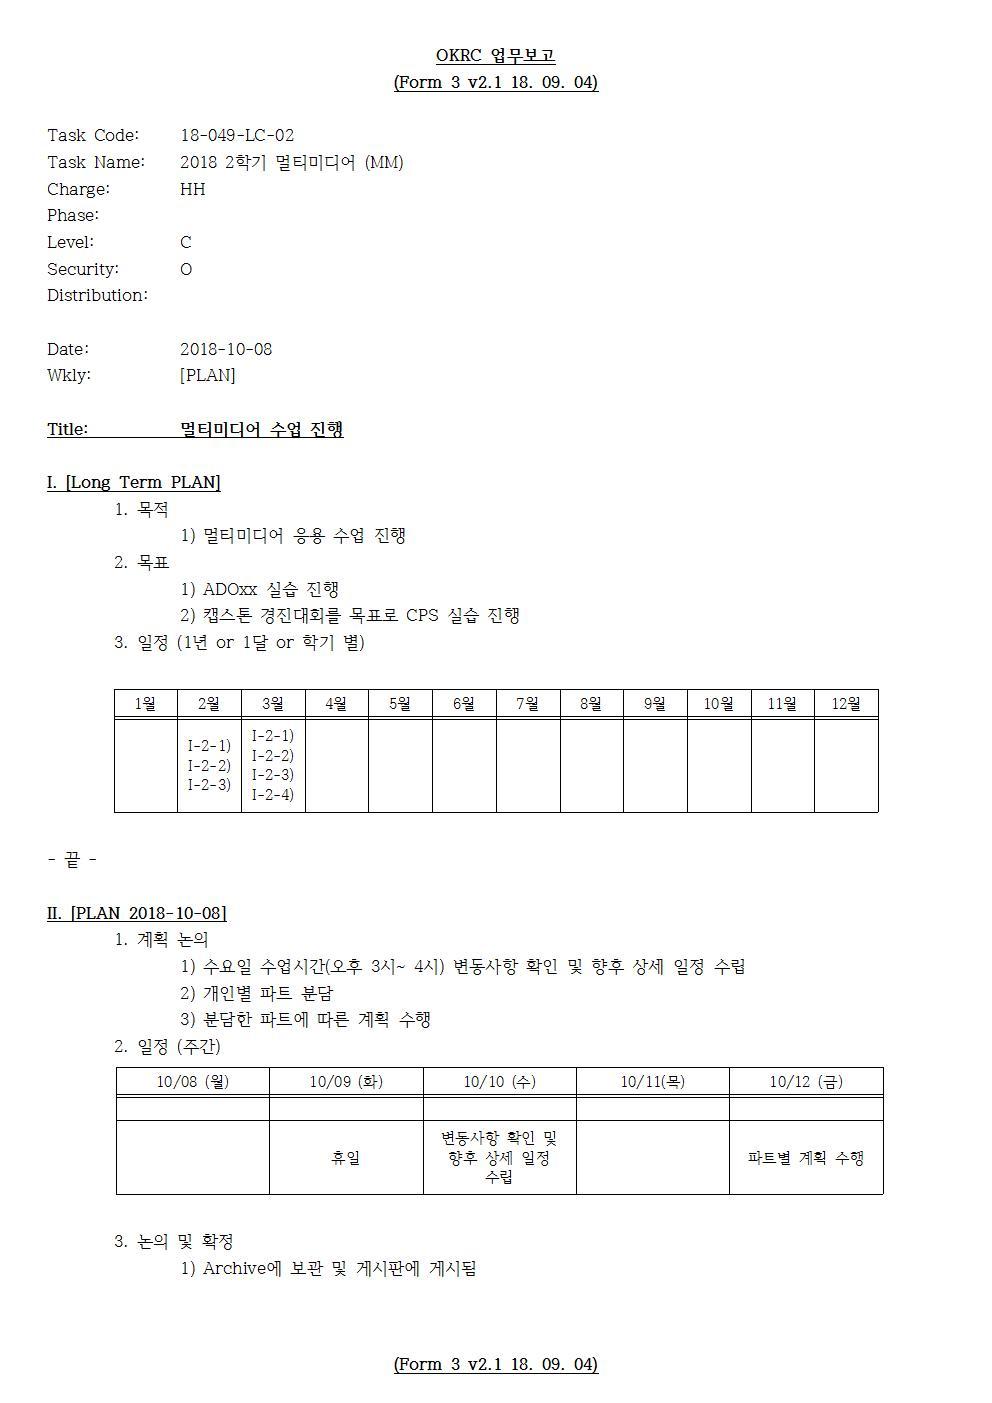 D-[18-049-LC-02]-[MM]-[2018-10-08][HH]001.jpg